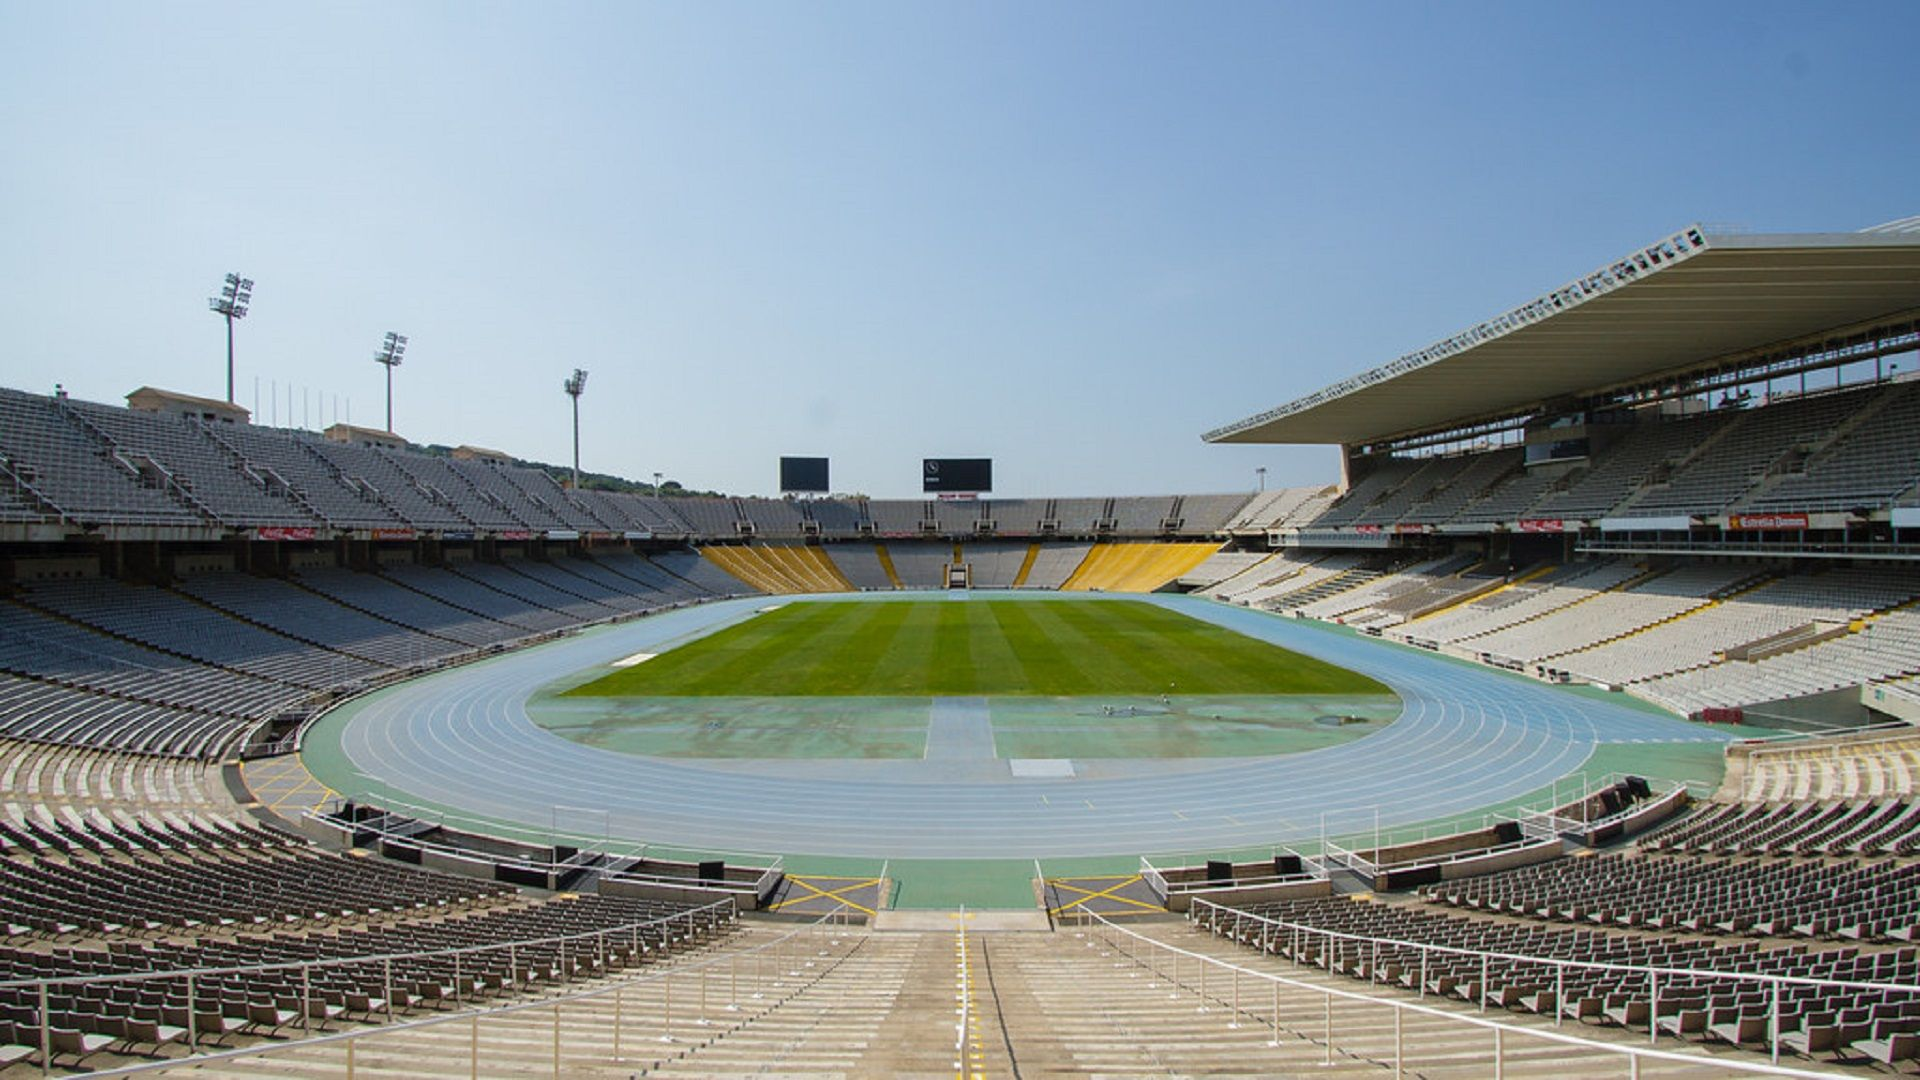 Олимписйки стадион в Барселона